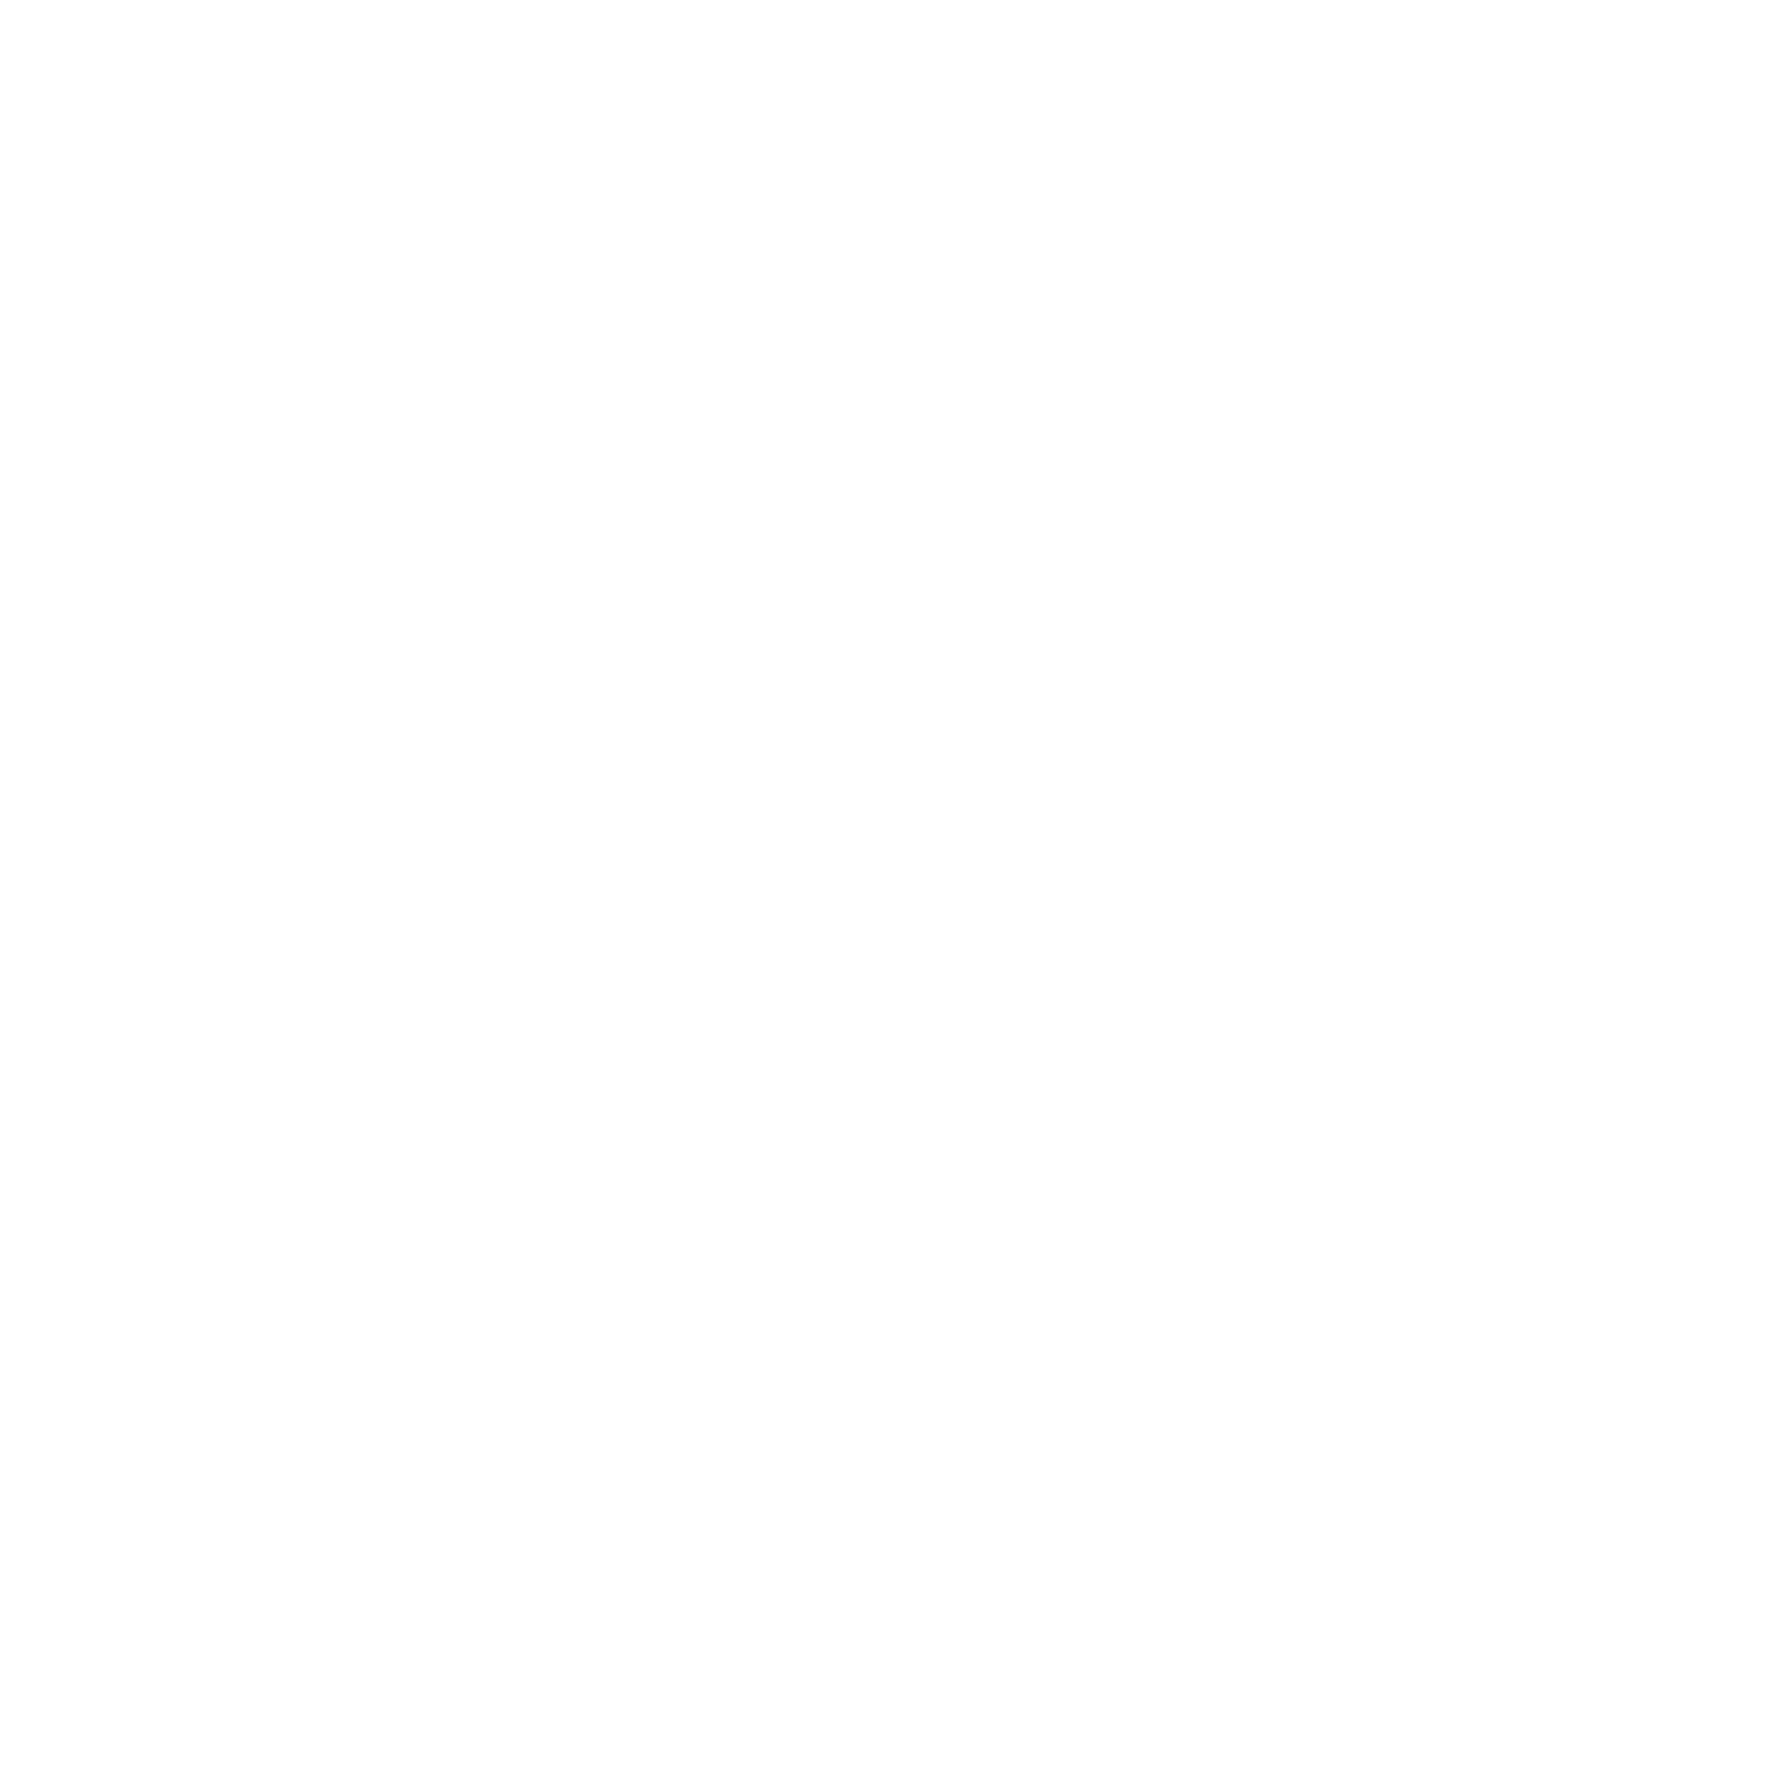 No Icon designed by Freepik from Flaticon